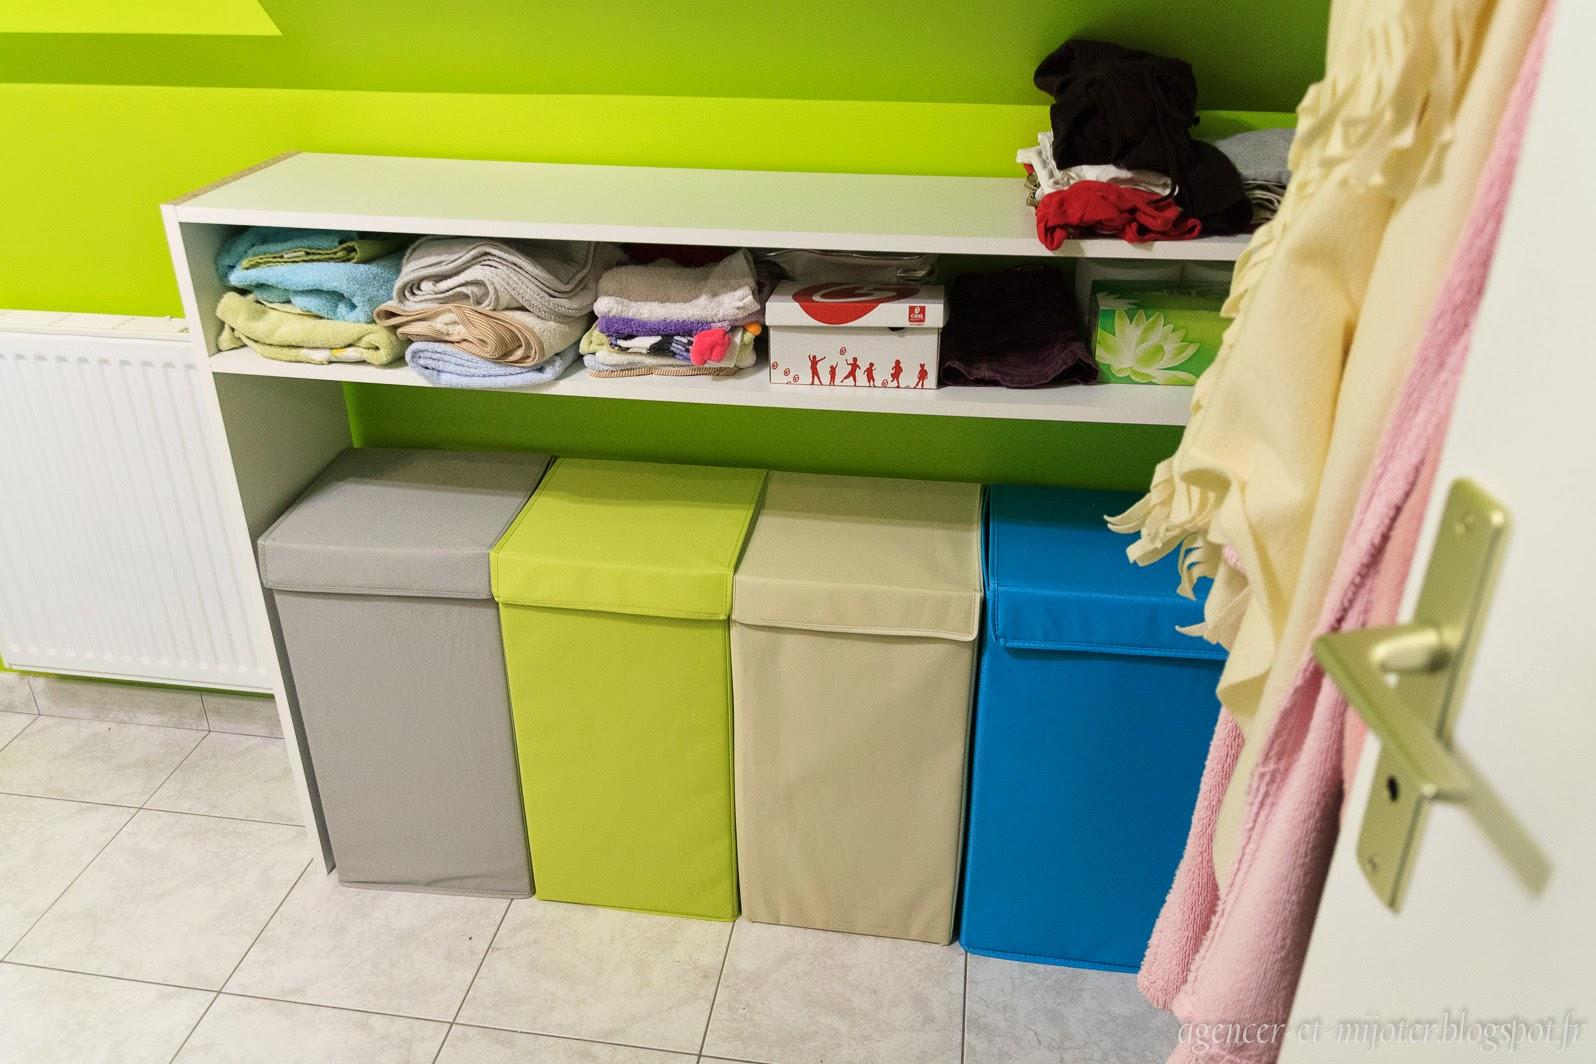 agencer et mijoter id e pratique et d co meuble sur. Black Bedroom Furniture Sets. Home Design Ideas